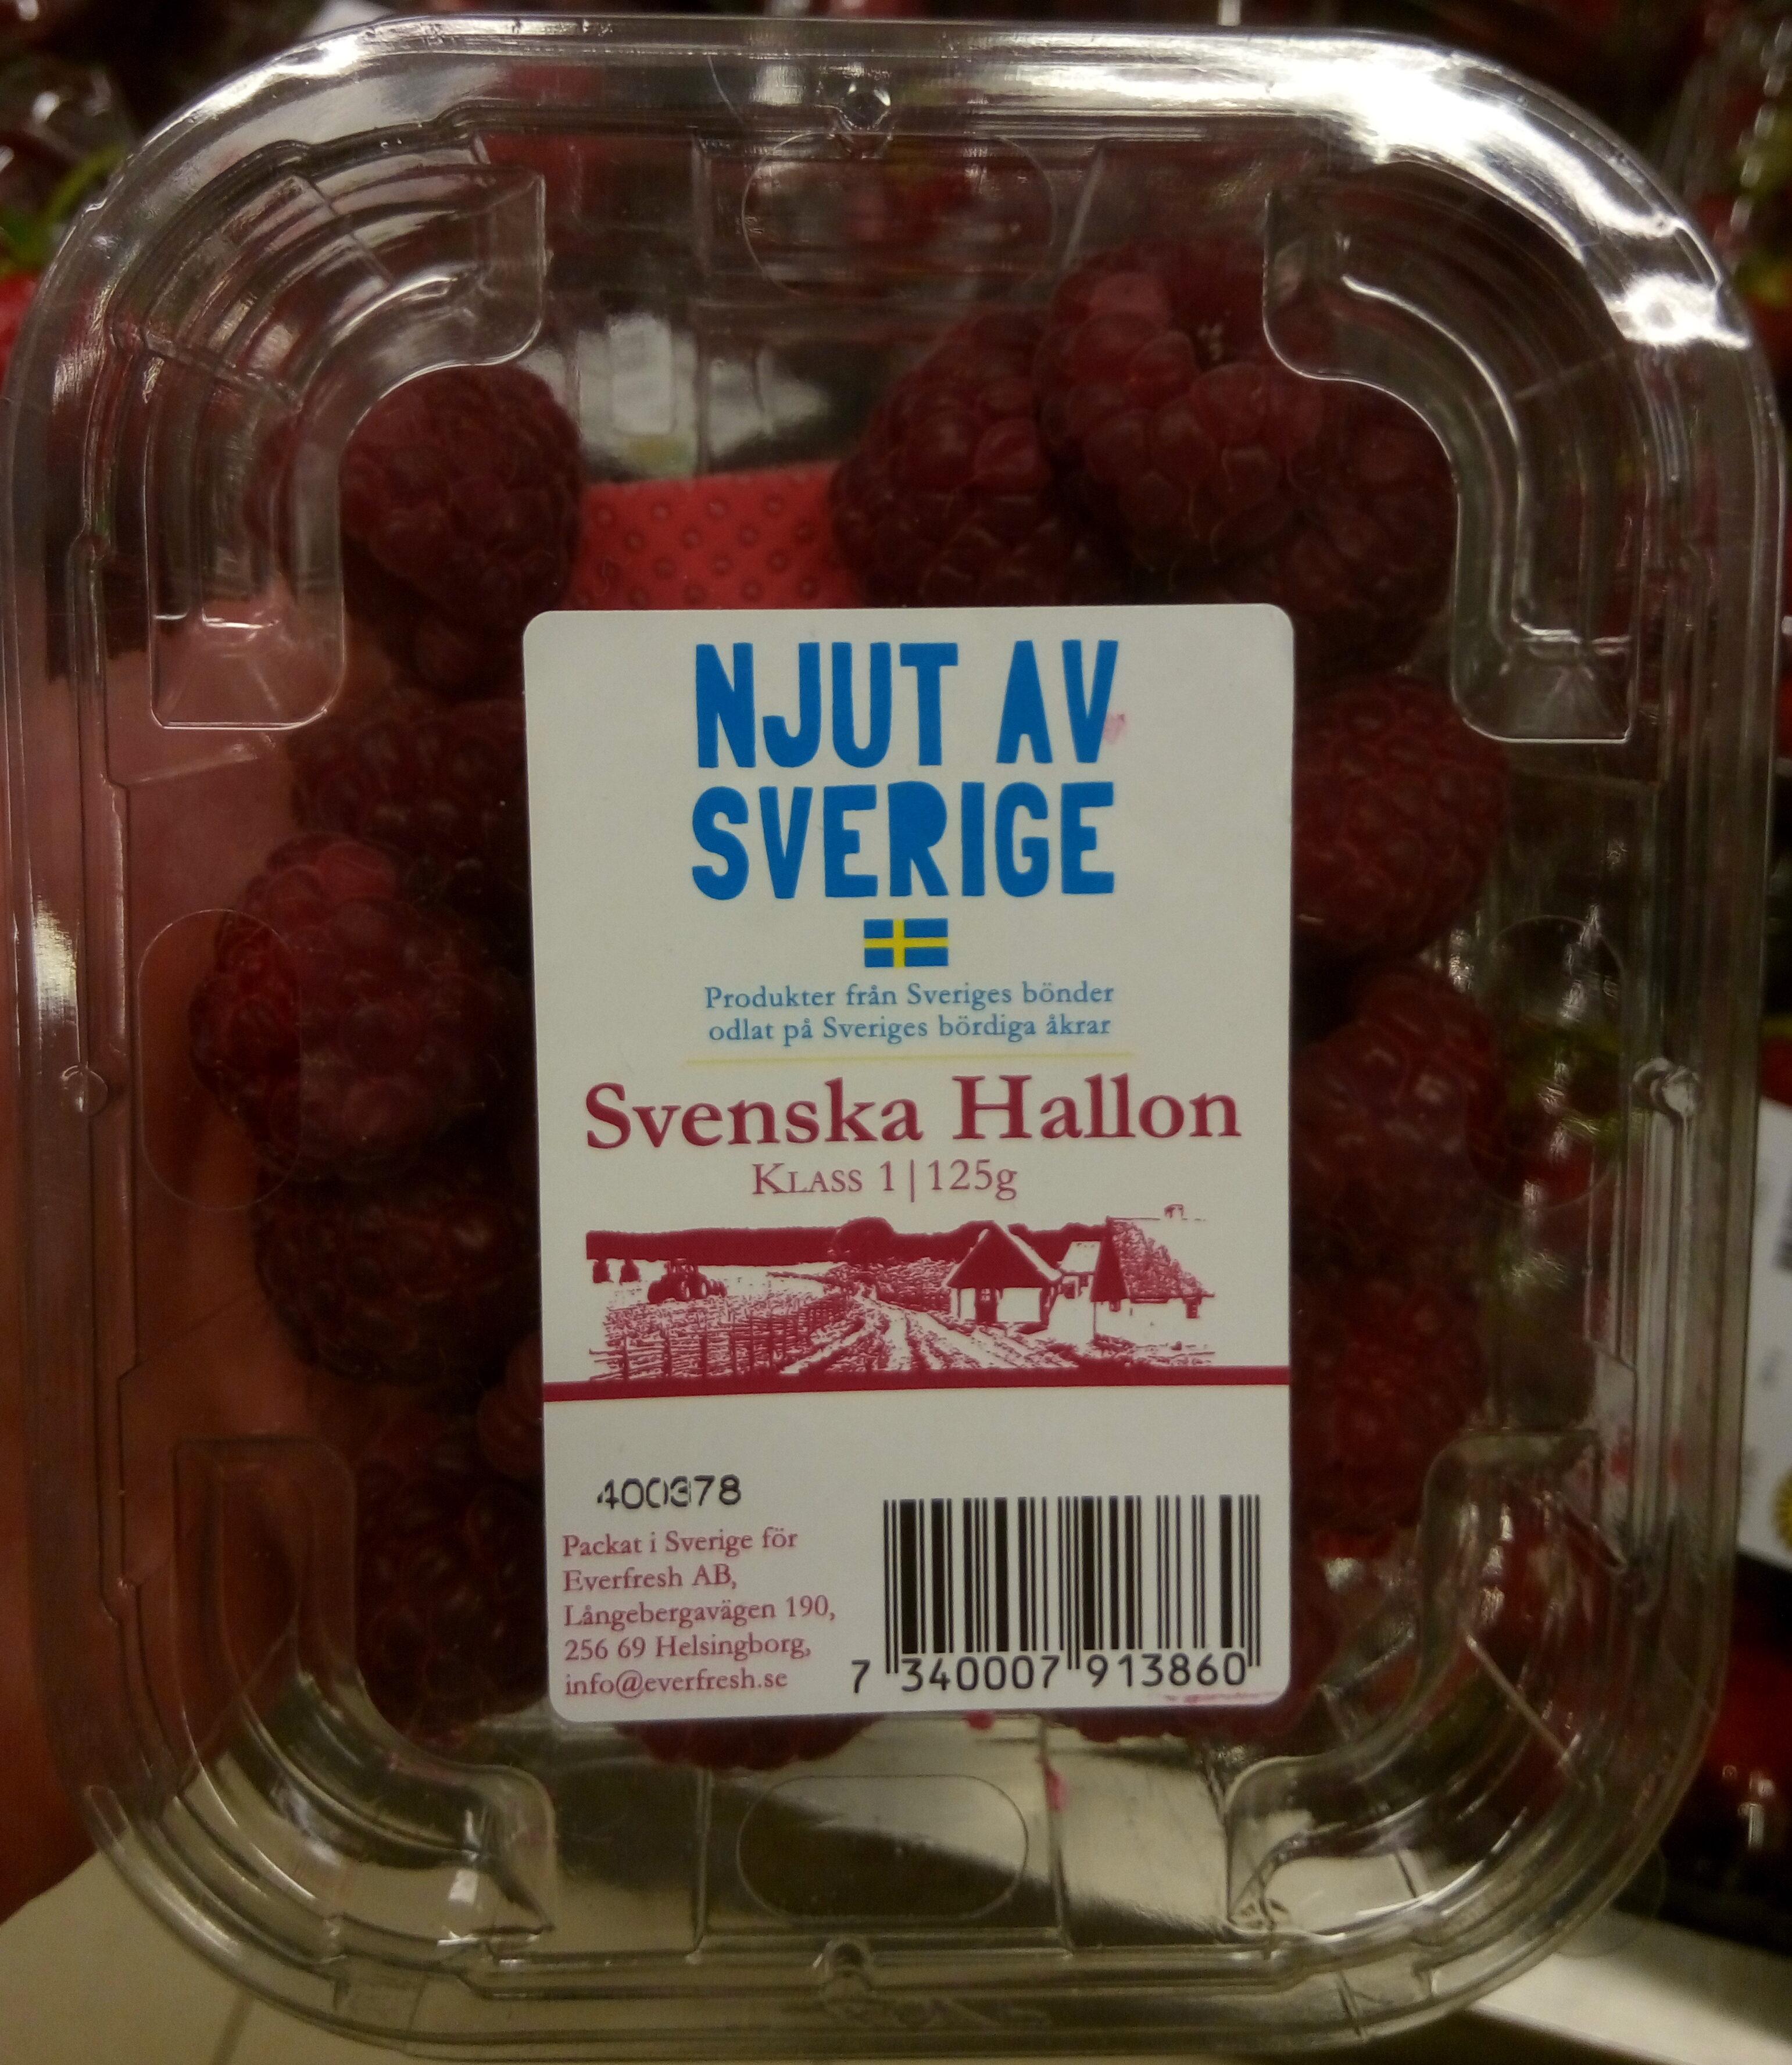 Njut Av Sverige Svenska Hallon - Product - sv